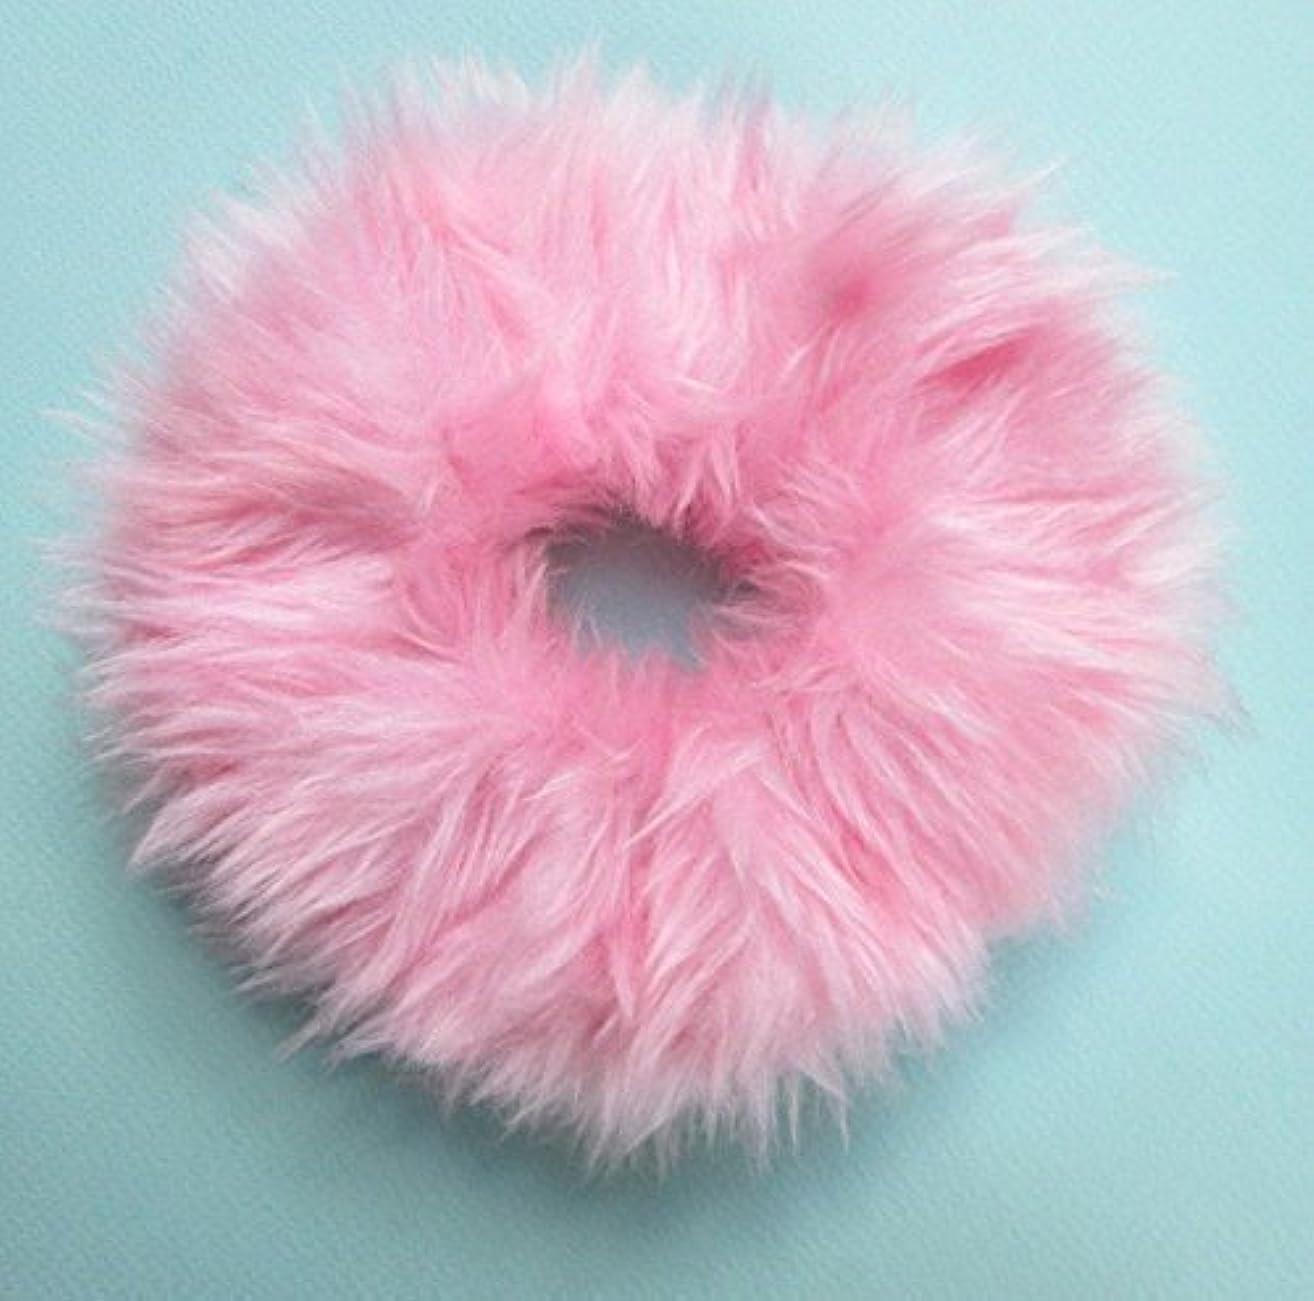 Fluffy Fuzzy Pink Scrunchie Fur Hair Tie Britney Spears Clueless 90s Pastel Goth Hair Tie Large Kawaii Handmade Ponytail Holder Pink Fur Hair Band